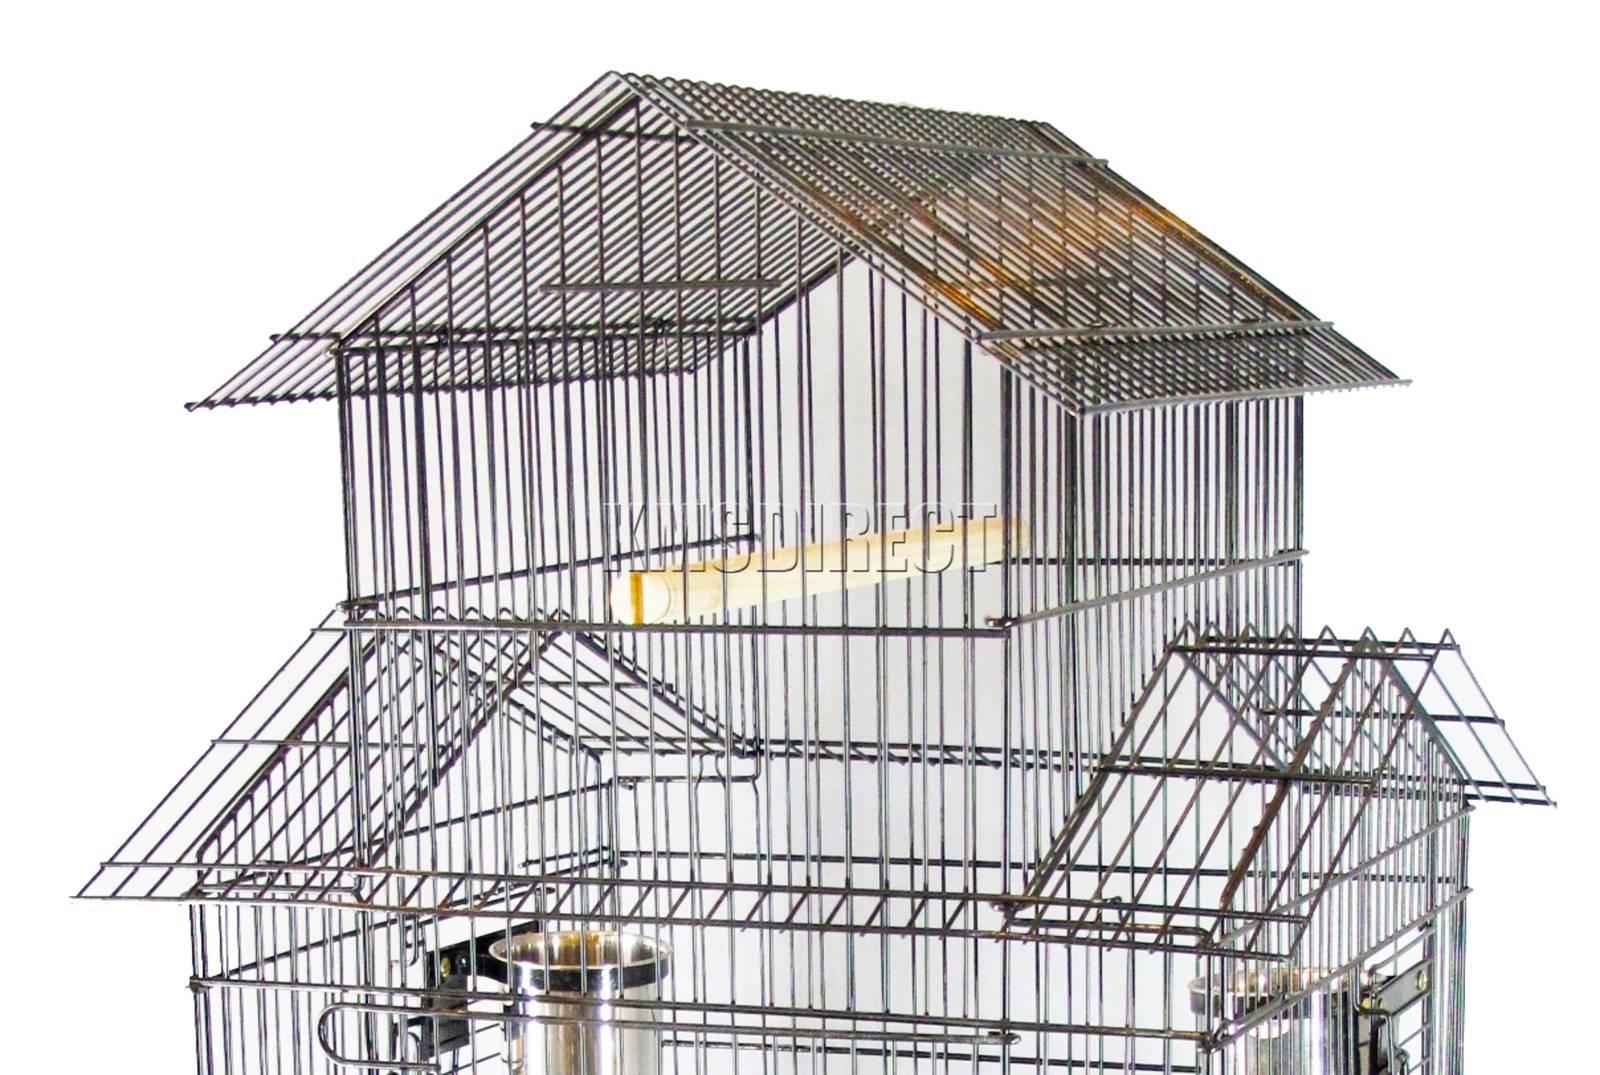 121998112507 2475 I 225 30 BIRD CAGE METAL MBC 02 HAMMERED SILVER KMSWM0302 - Foxhunter Grande Metal Jaula con Soporte Pajarera Loro Periquito Canario Cacatua